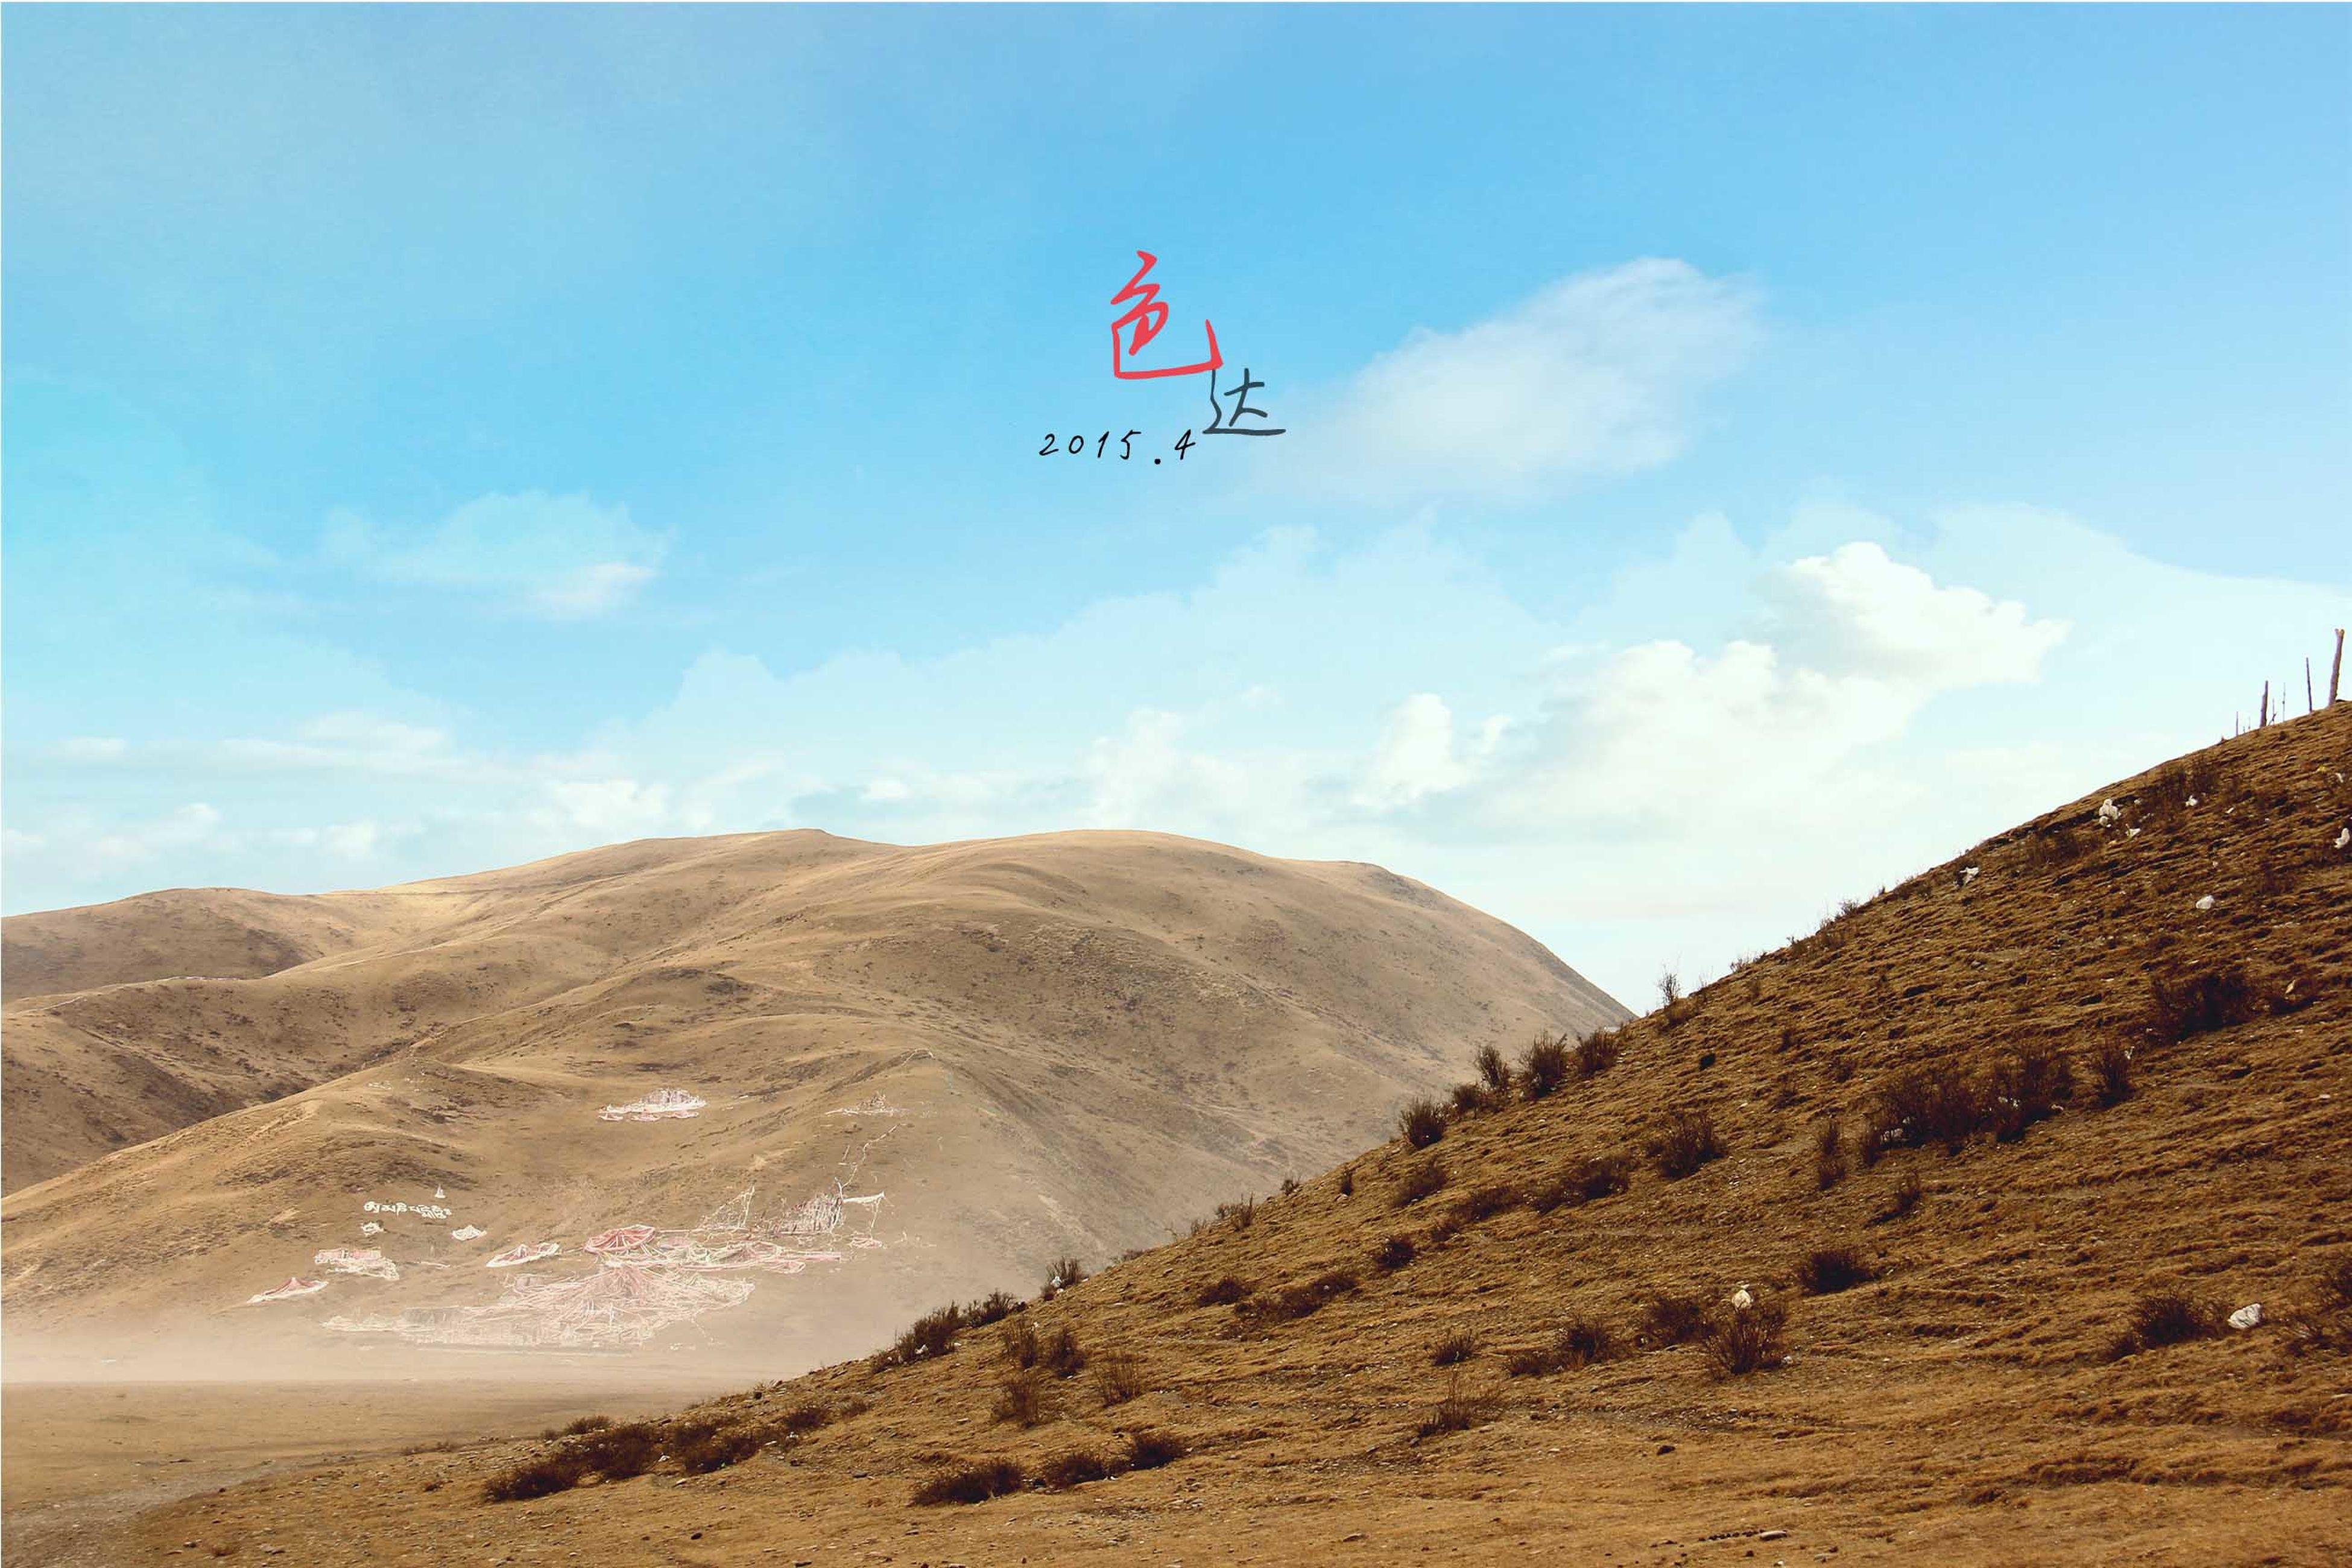 sky, flag, sand, beach, flying, transportation, sunlight, blue, identity, day, scenics, landscape, tranquility, nature, cloud - sky, mountain, patriotism, sea, cloud, tranquil scene